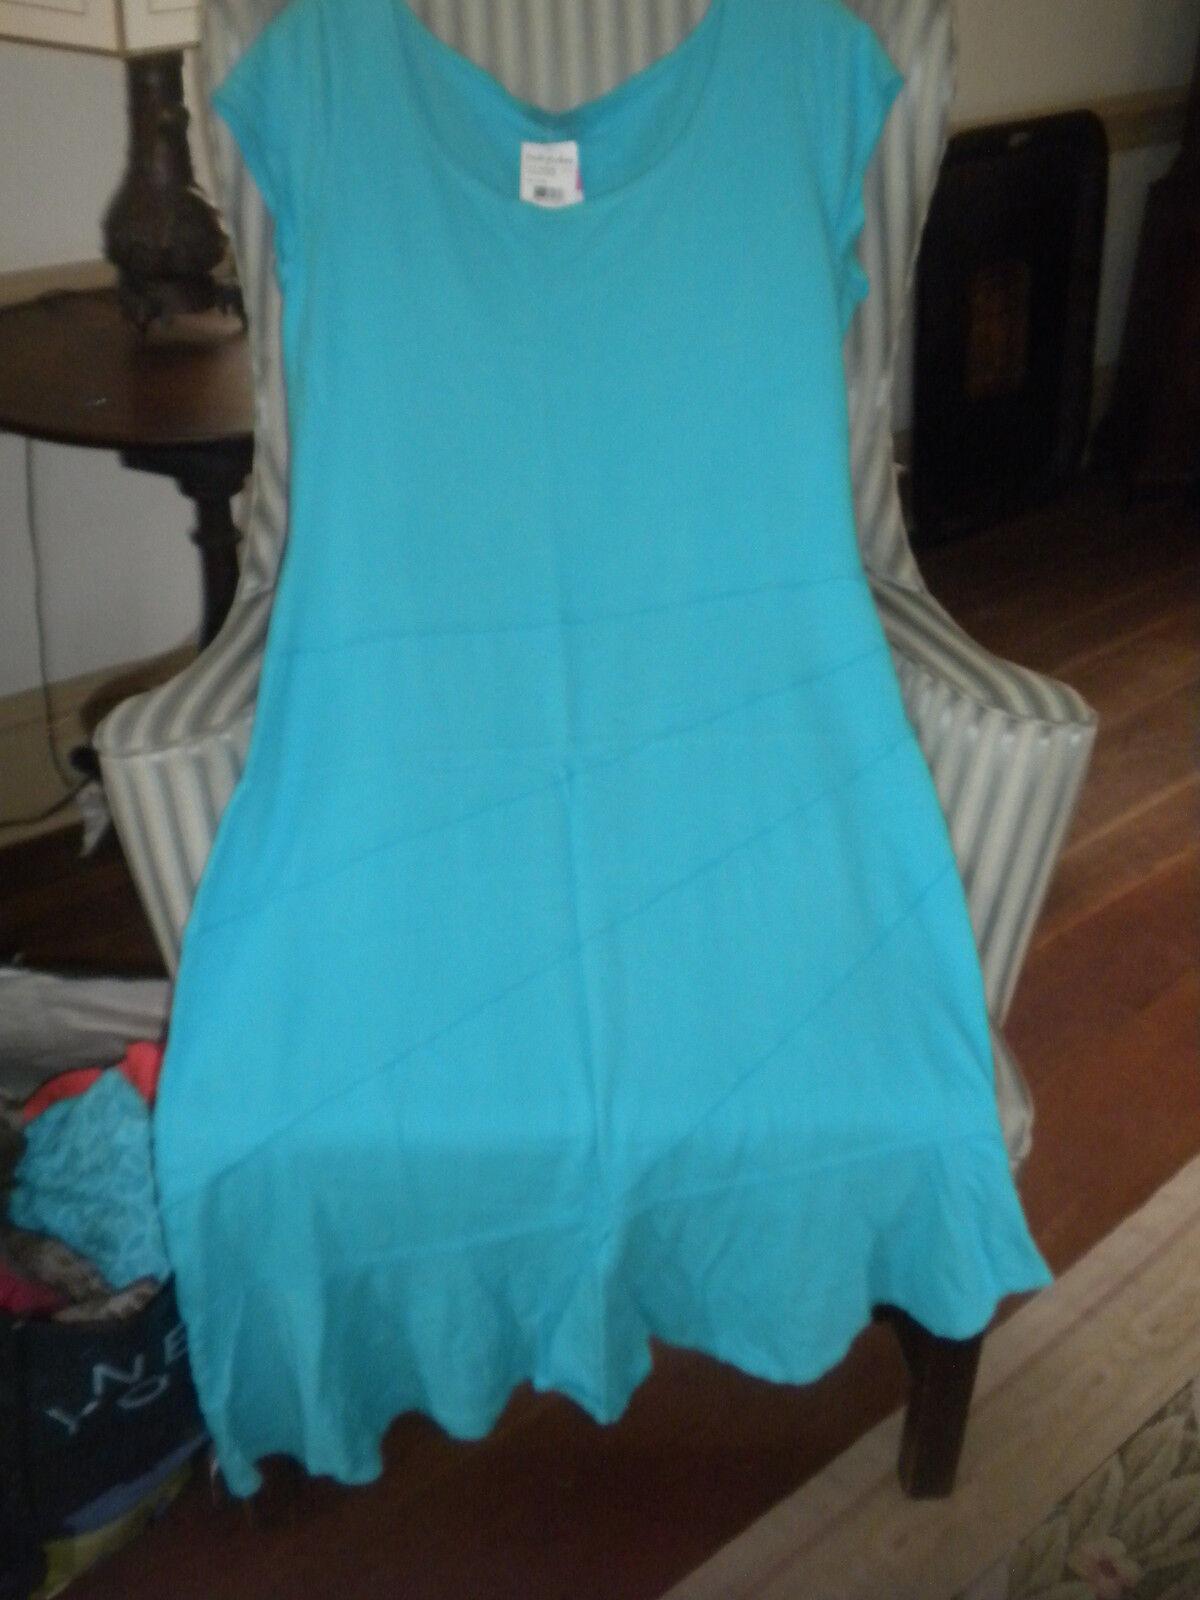 NWT    FRESH PRODUCE 100%  COTTON  FLATTERING   SUNBURST   STYLE  DRESS  (L M)